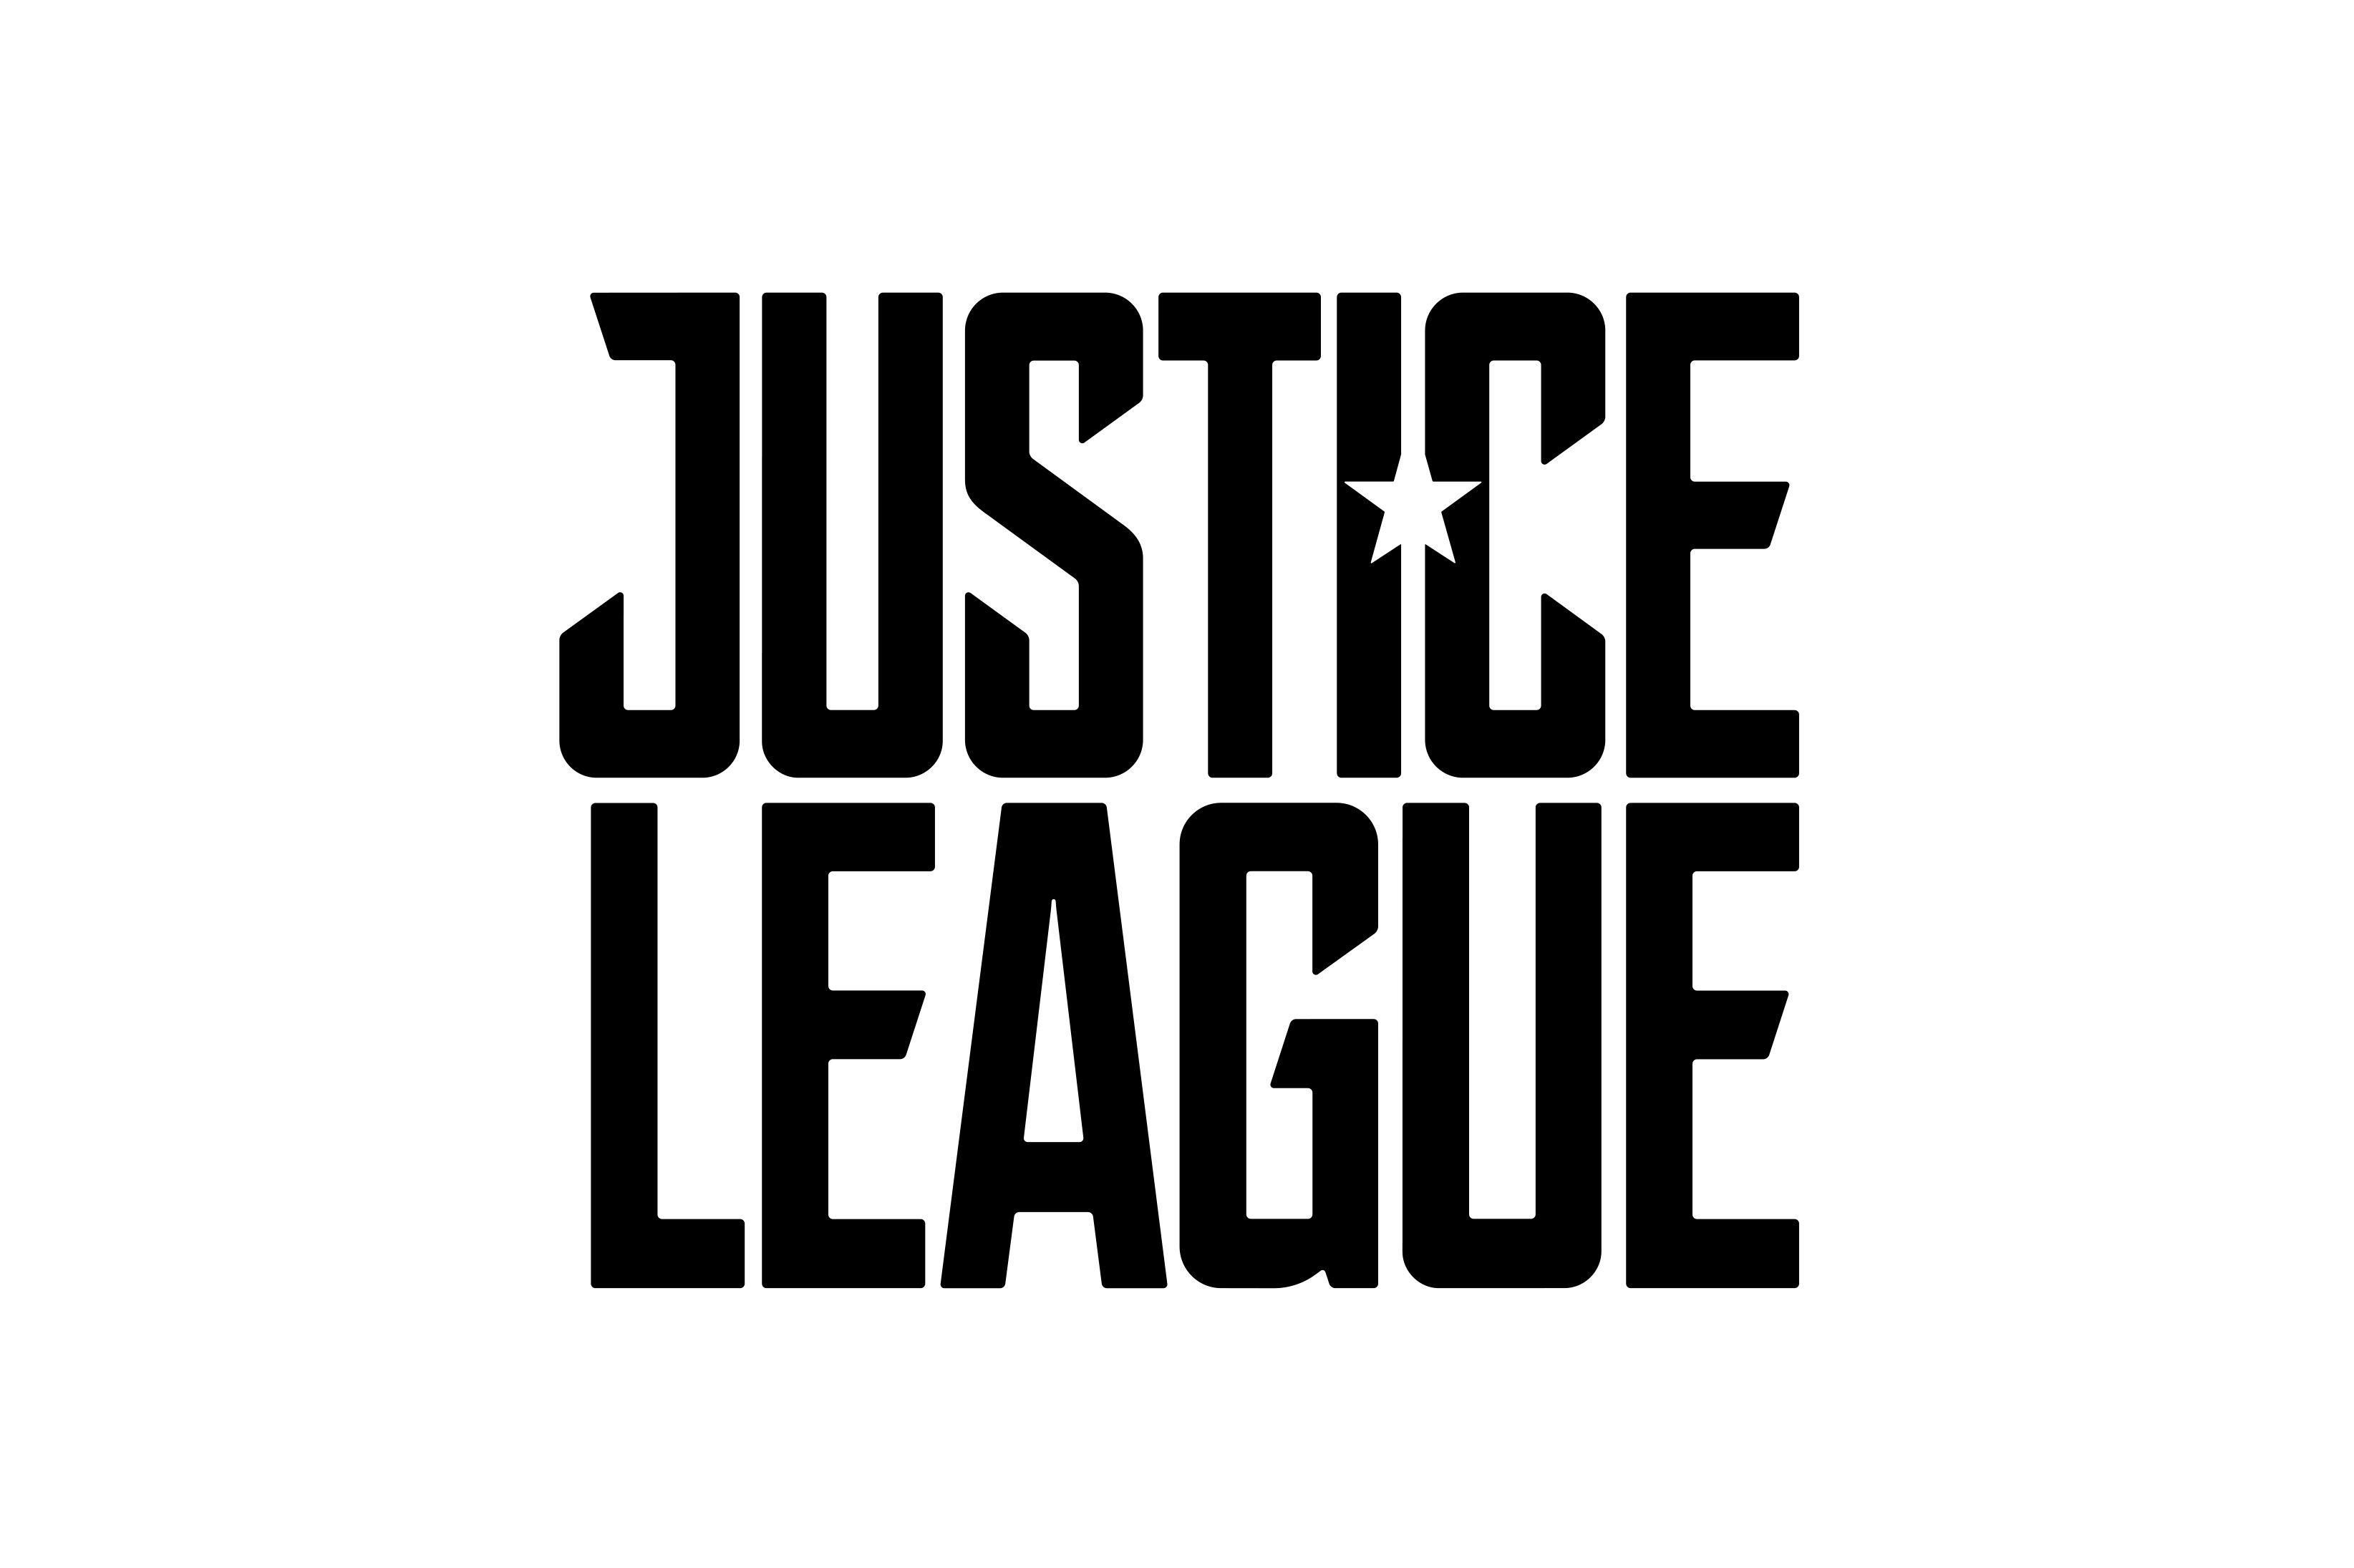 Justice-League-Movie-Logo-White-BG